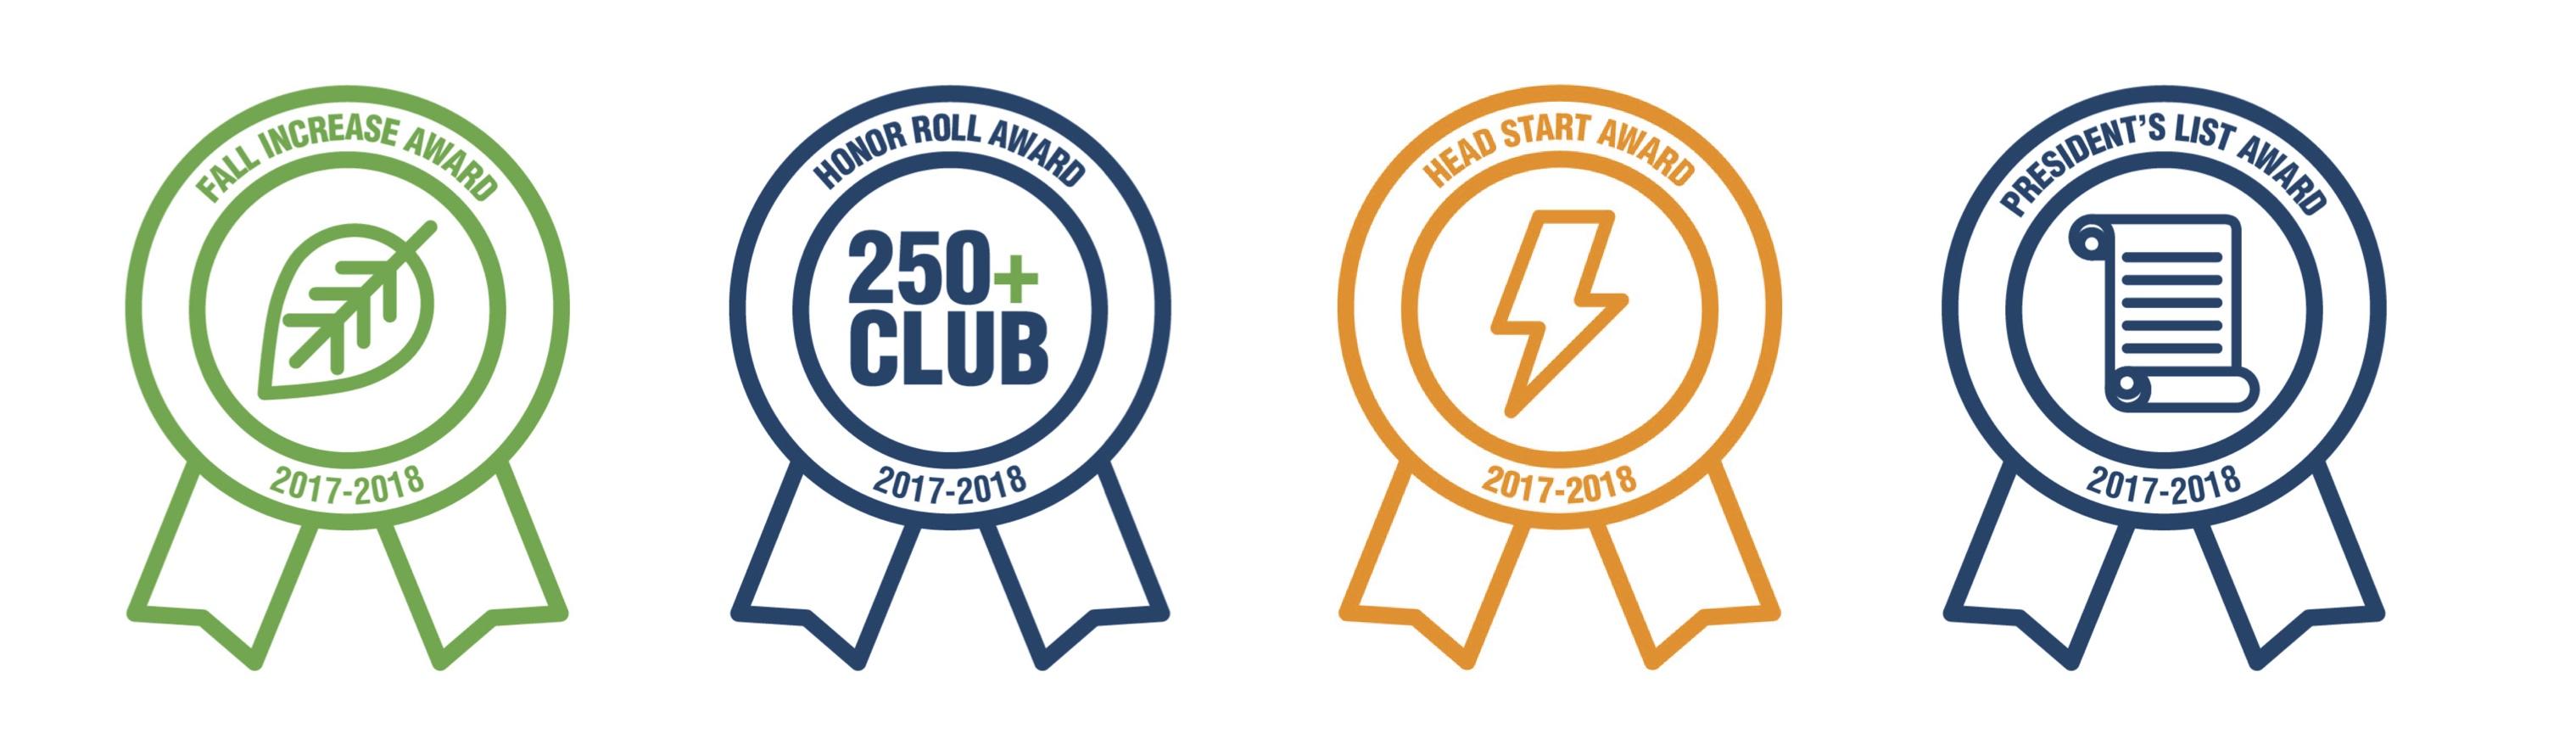 2017 18 texas pta membership awards